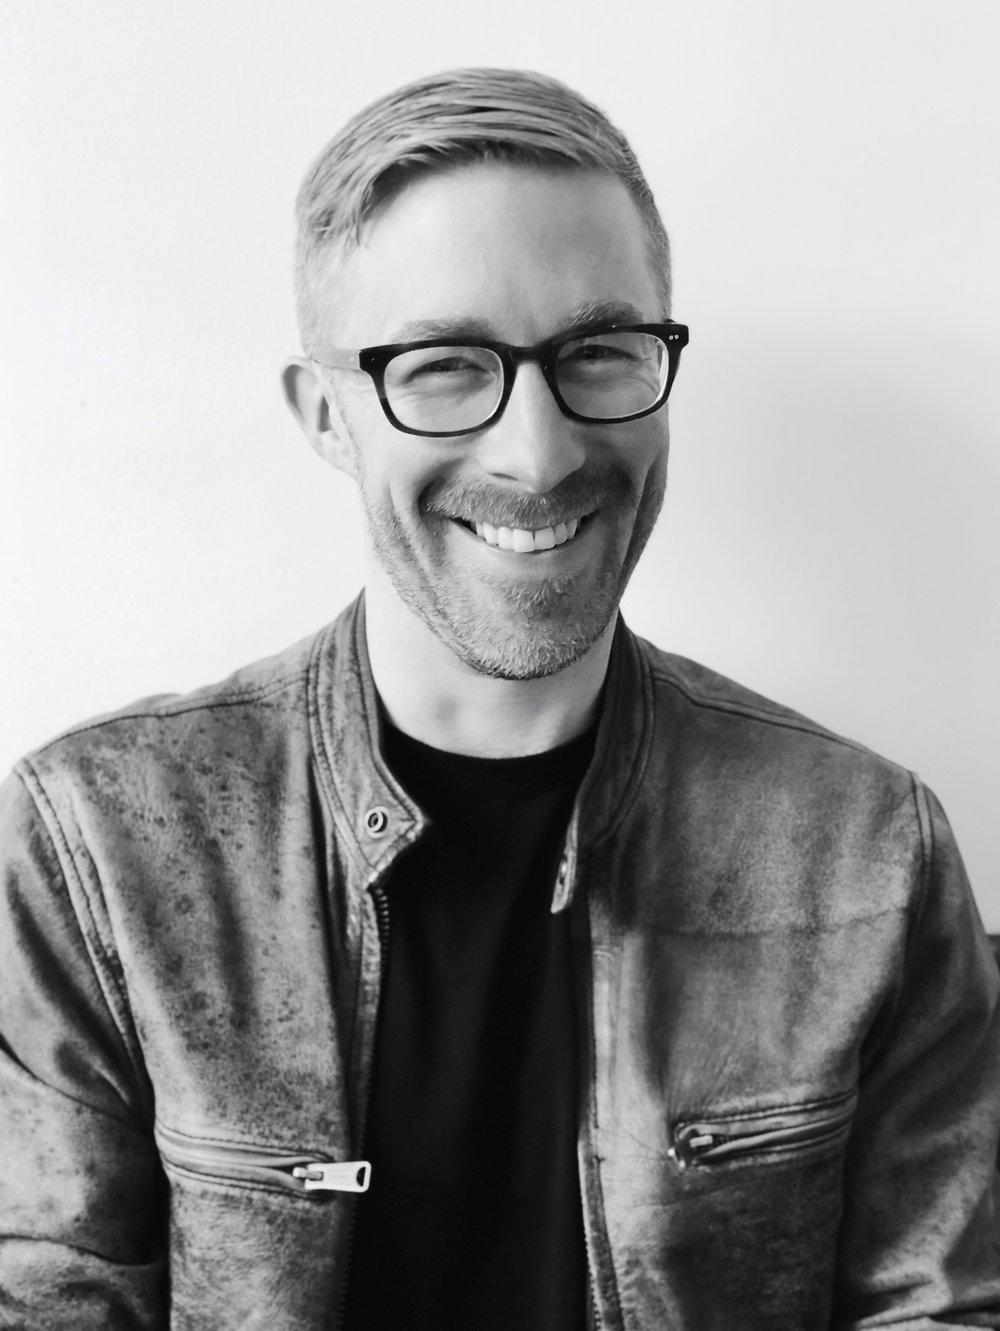 Hi, I'm Chris Messina - Ever-curious product designer and technologist. Hashtag inventor. Previously: Molly.com (YC W18), Uber, Google.